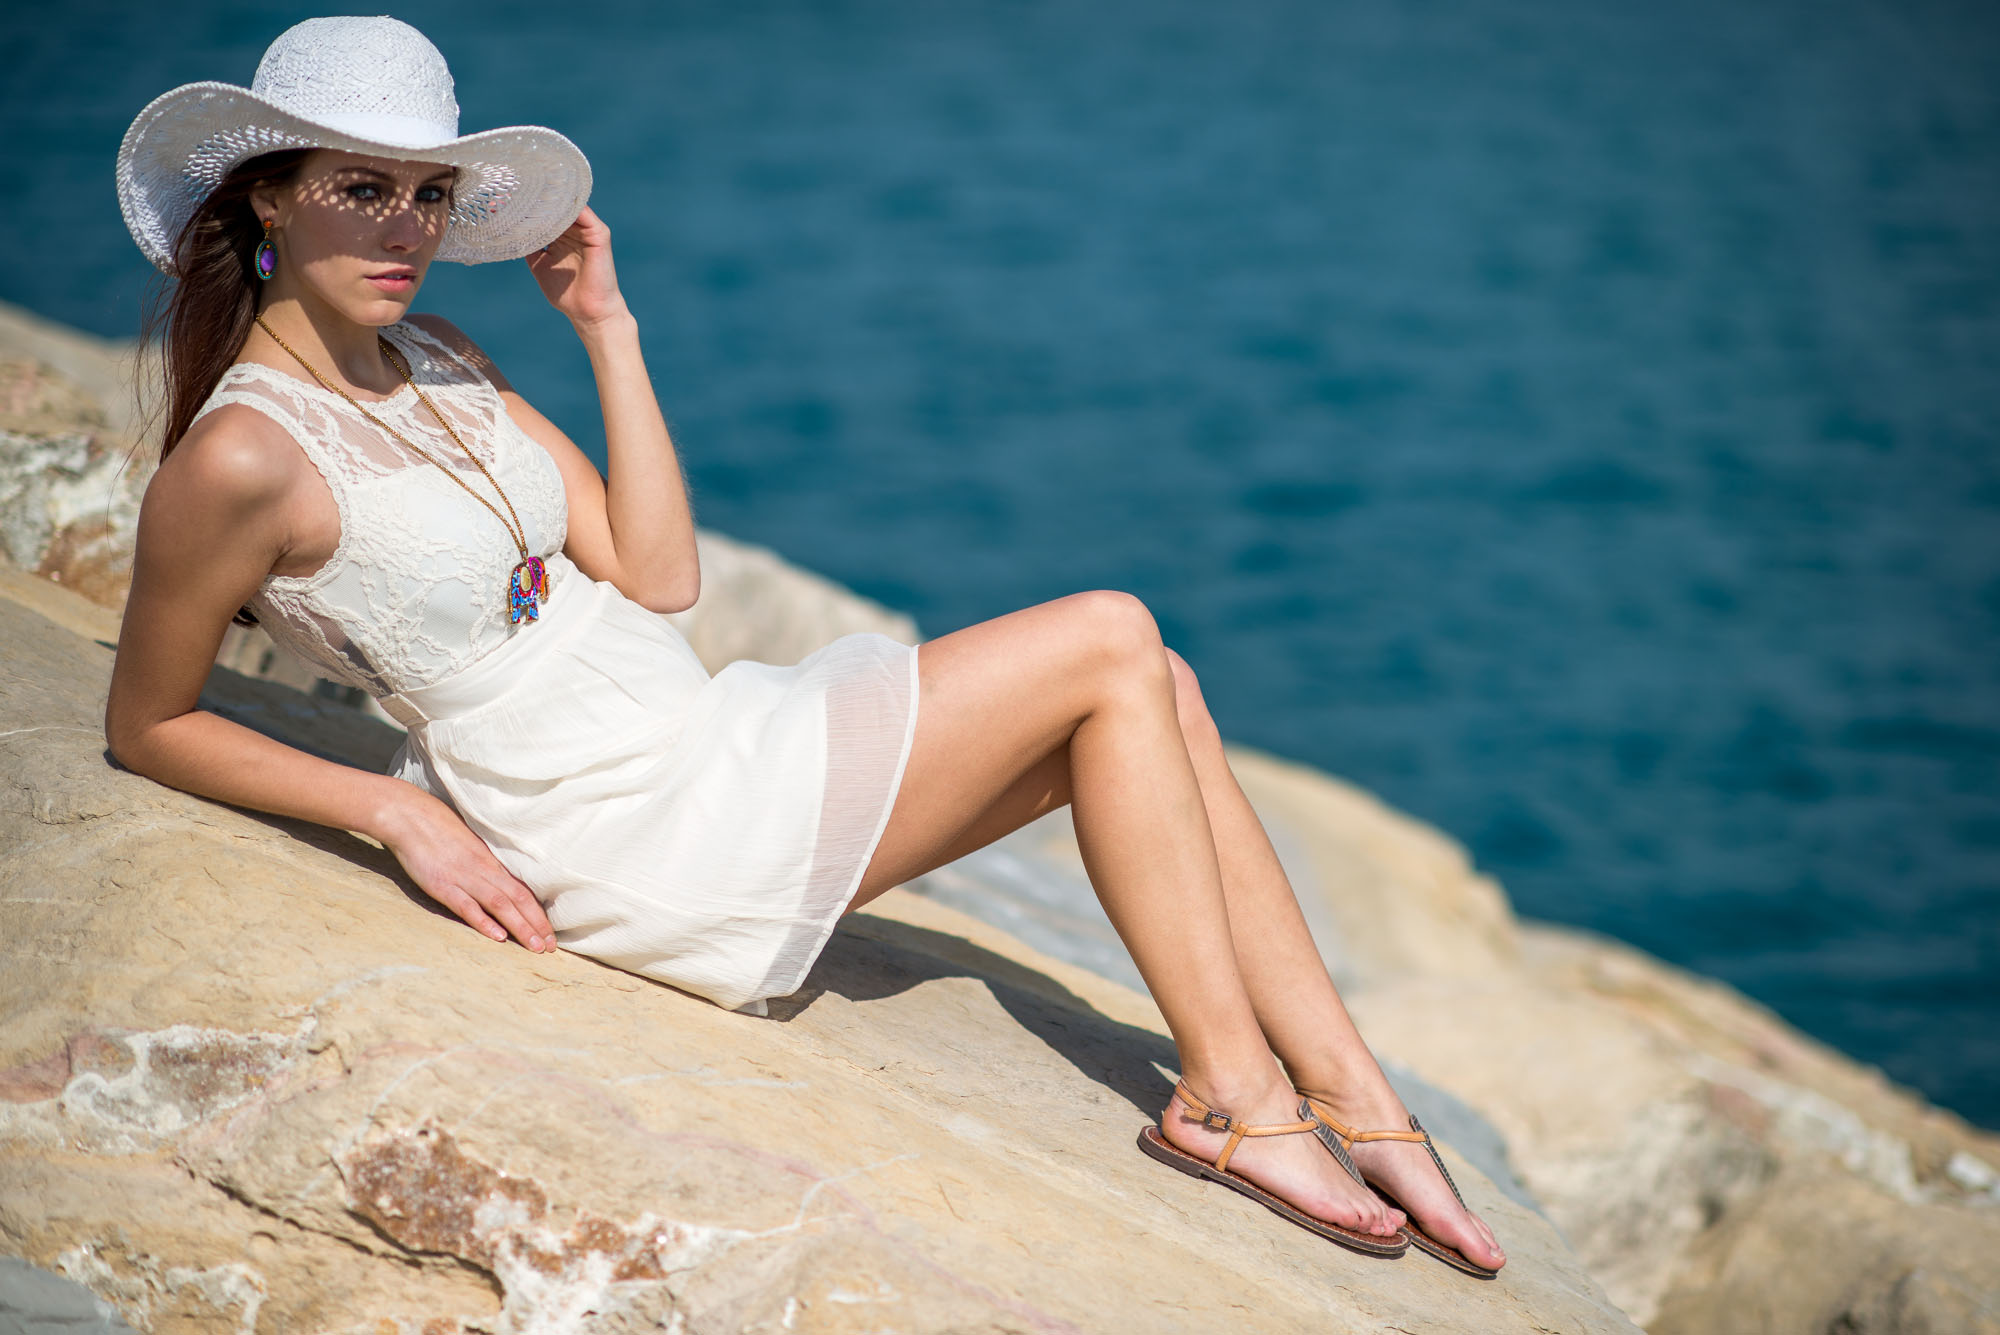 Noba-zomer-2014-modellen-Alicia-small-JPG-008.jpg